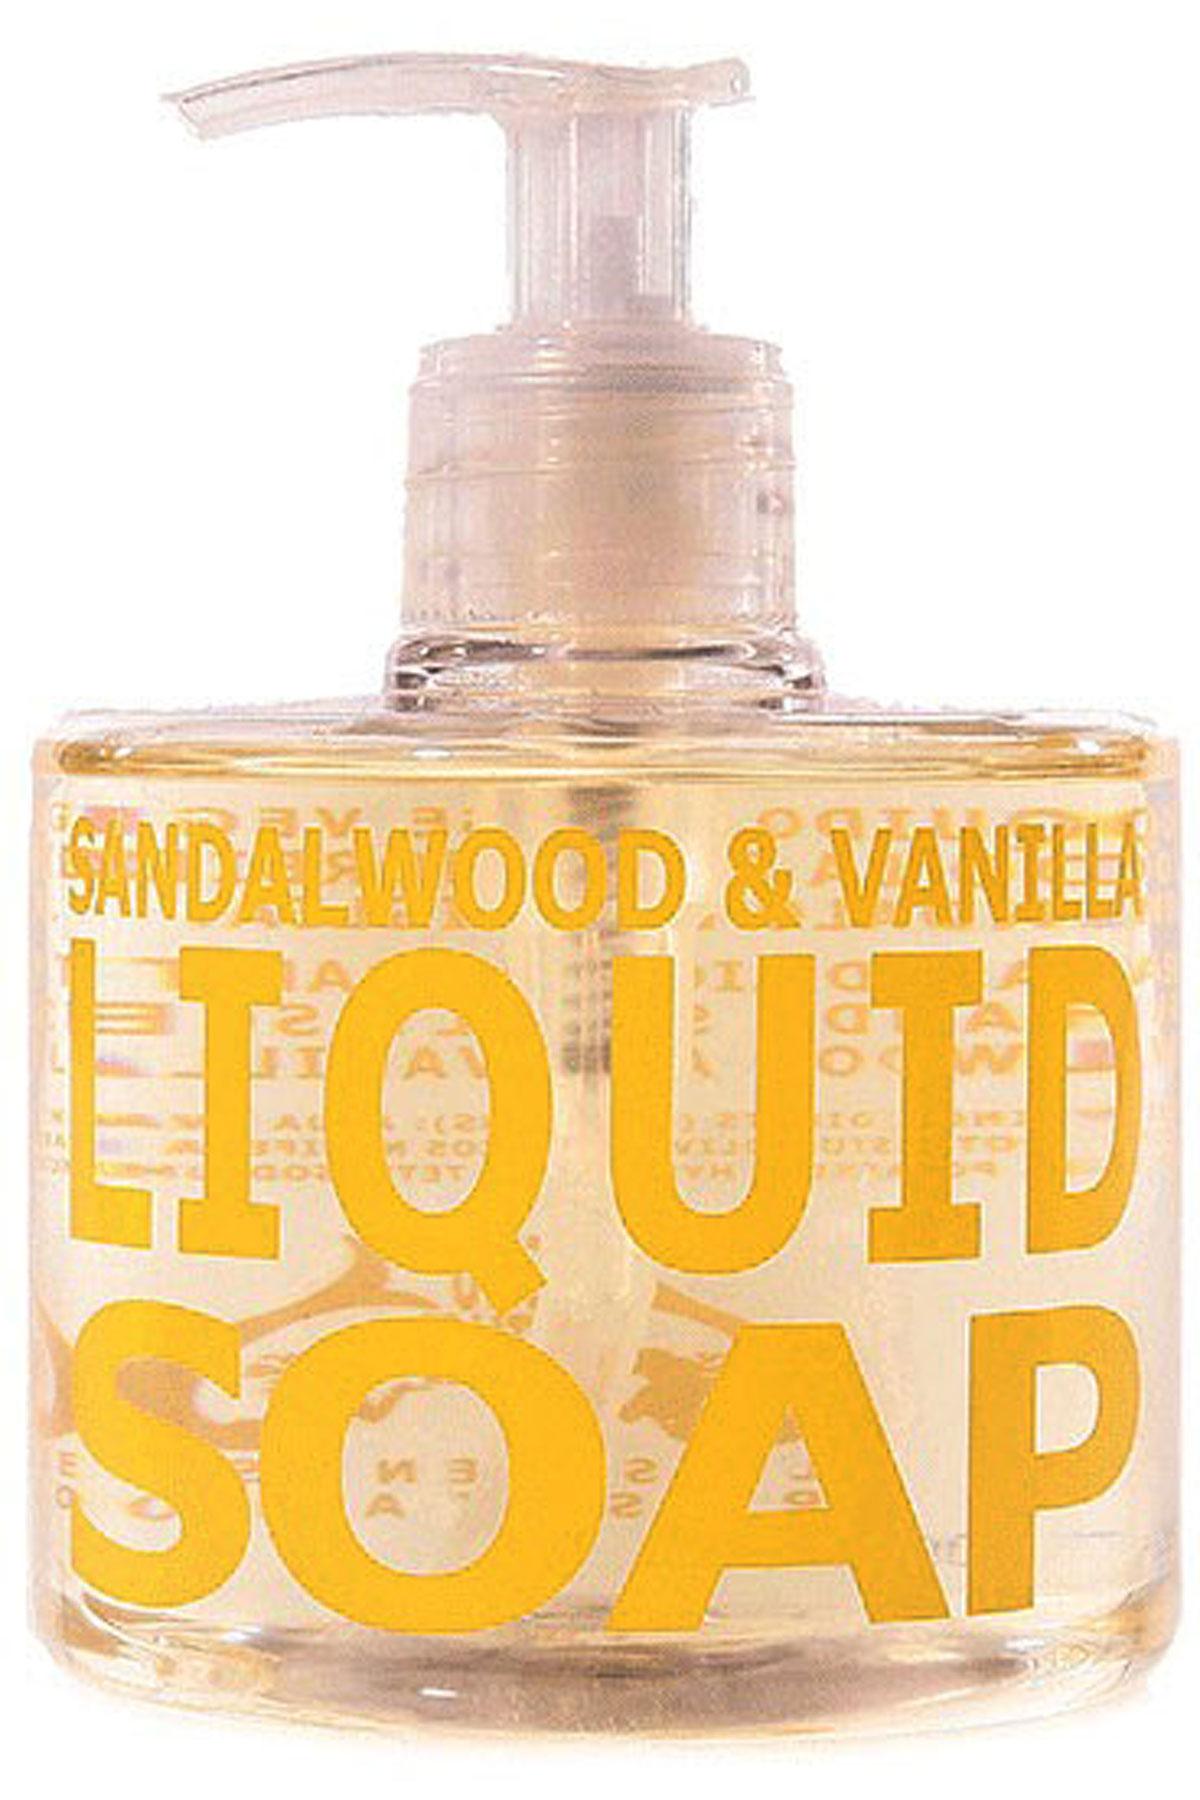 Eau D Italie Beauty for Men, Sandalwood And Vanilla - Liquid Soap - 300 Ml, 2019, 300 ml